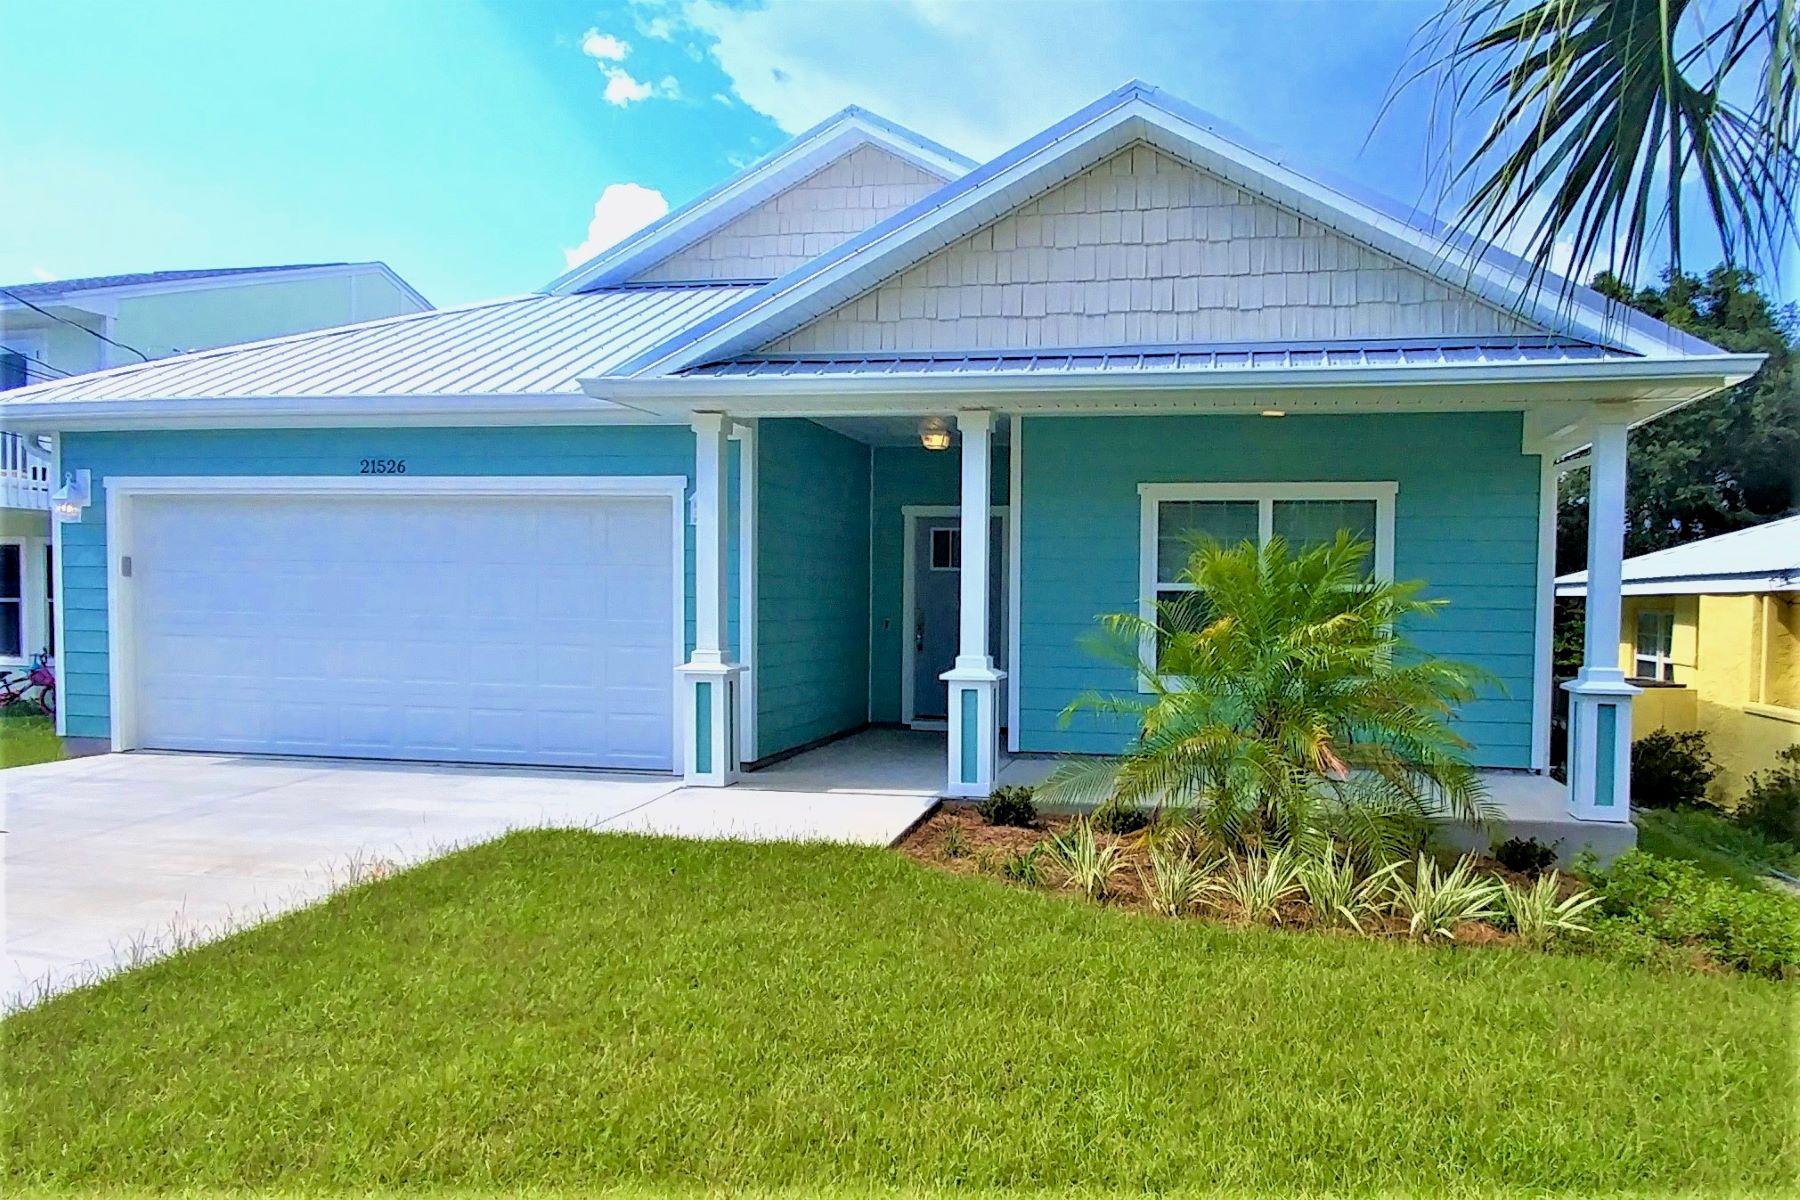 Single Family Homes für Verkauf beim Recently Constructed Beach Home Conveys Furnished 21526 Dolphin Avenue, Panama City Beach, Florida 32413 Vereinigte Staaten